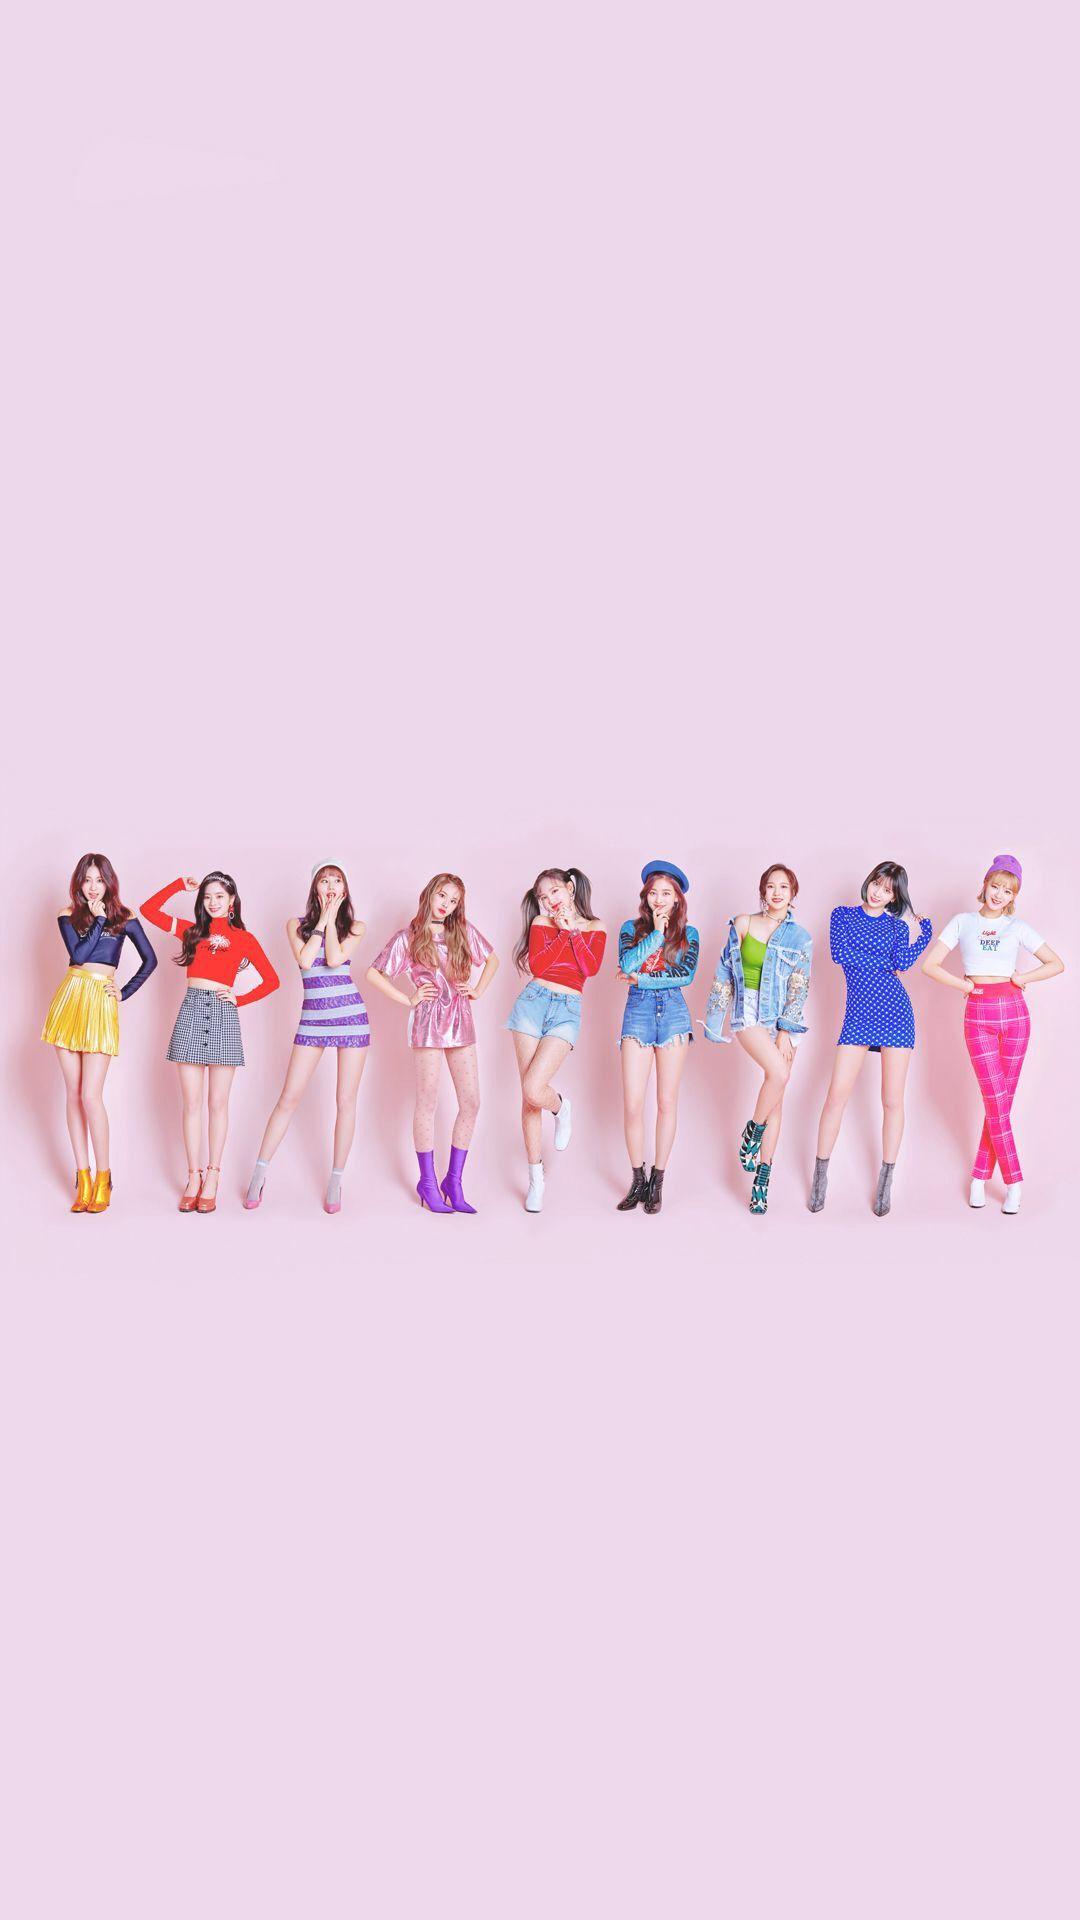 i lOVE TZUYUS OUTFIT TWICE Kpop Twice what is love Kpop 1080x1920